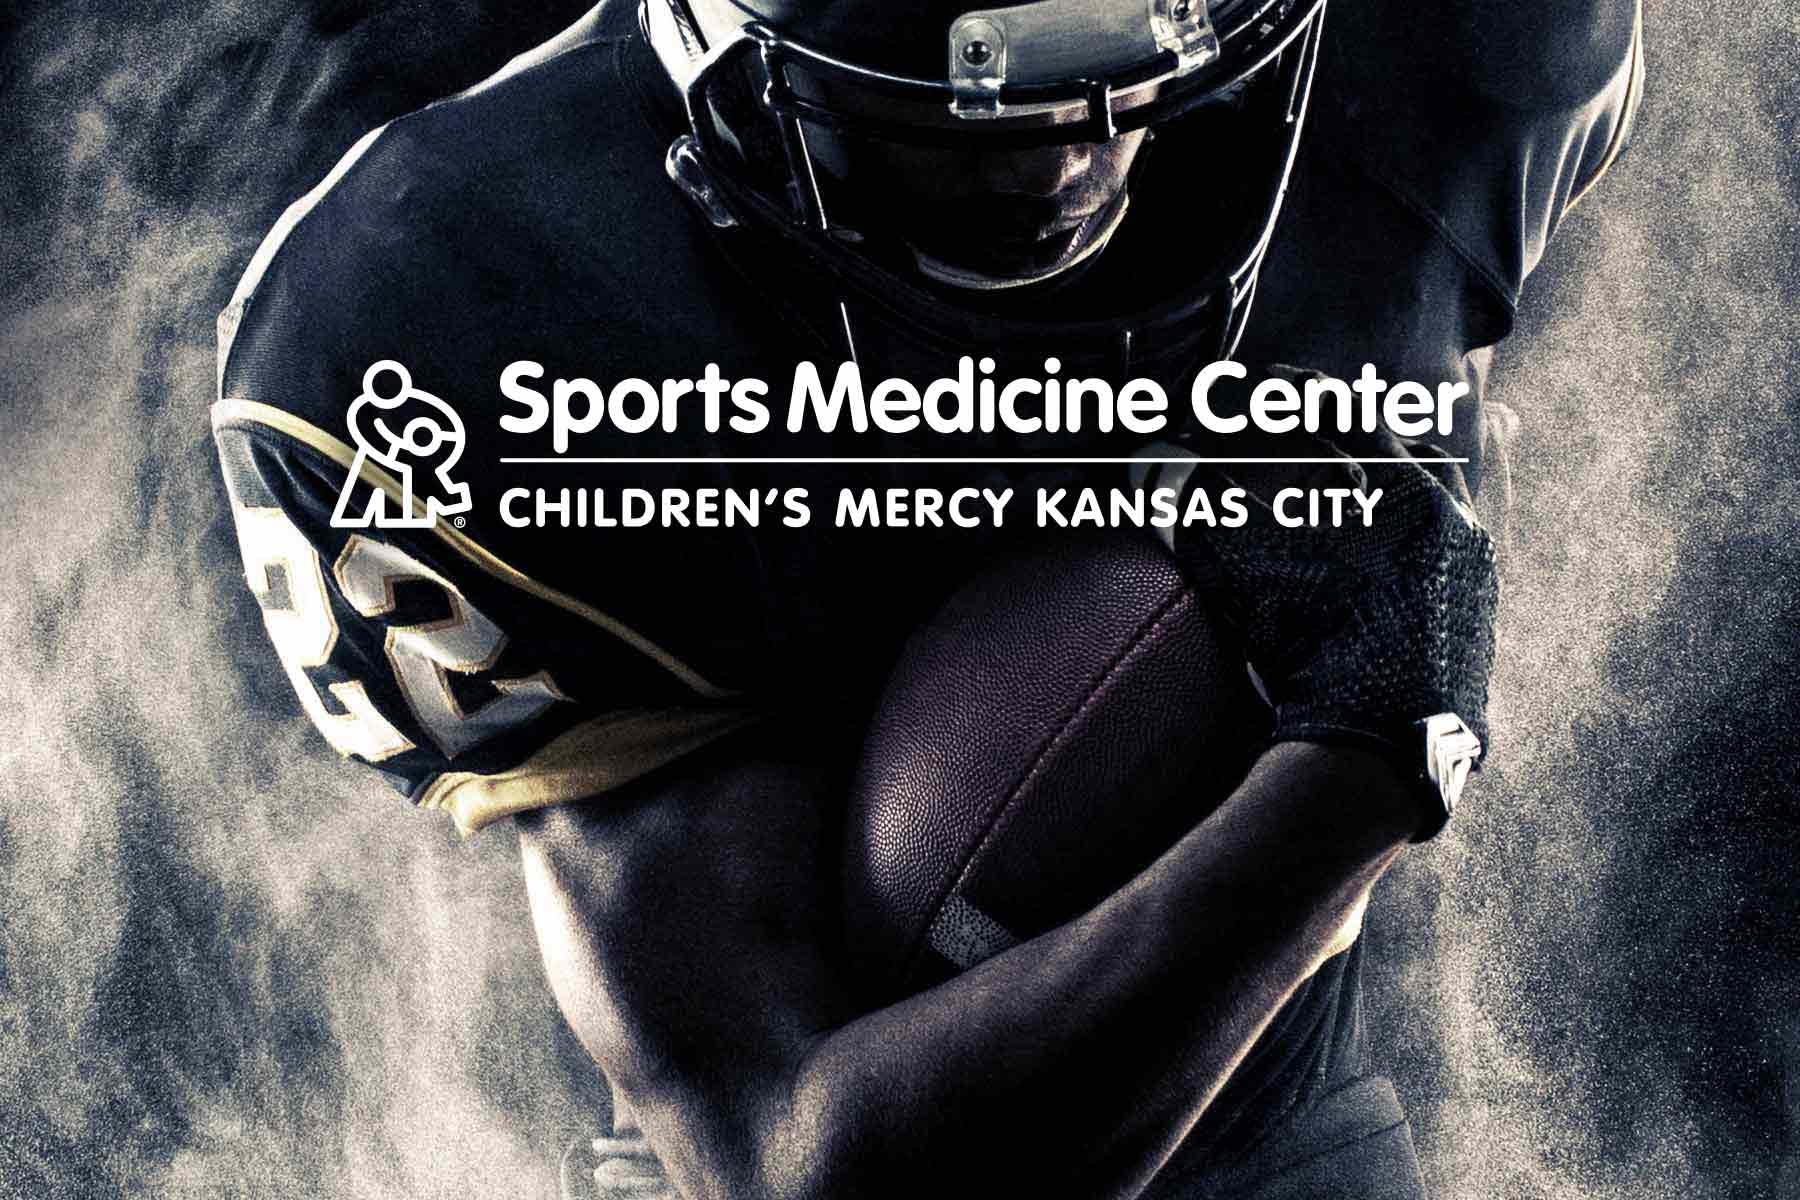 Sports Medicine Center